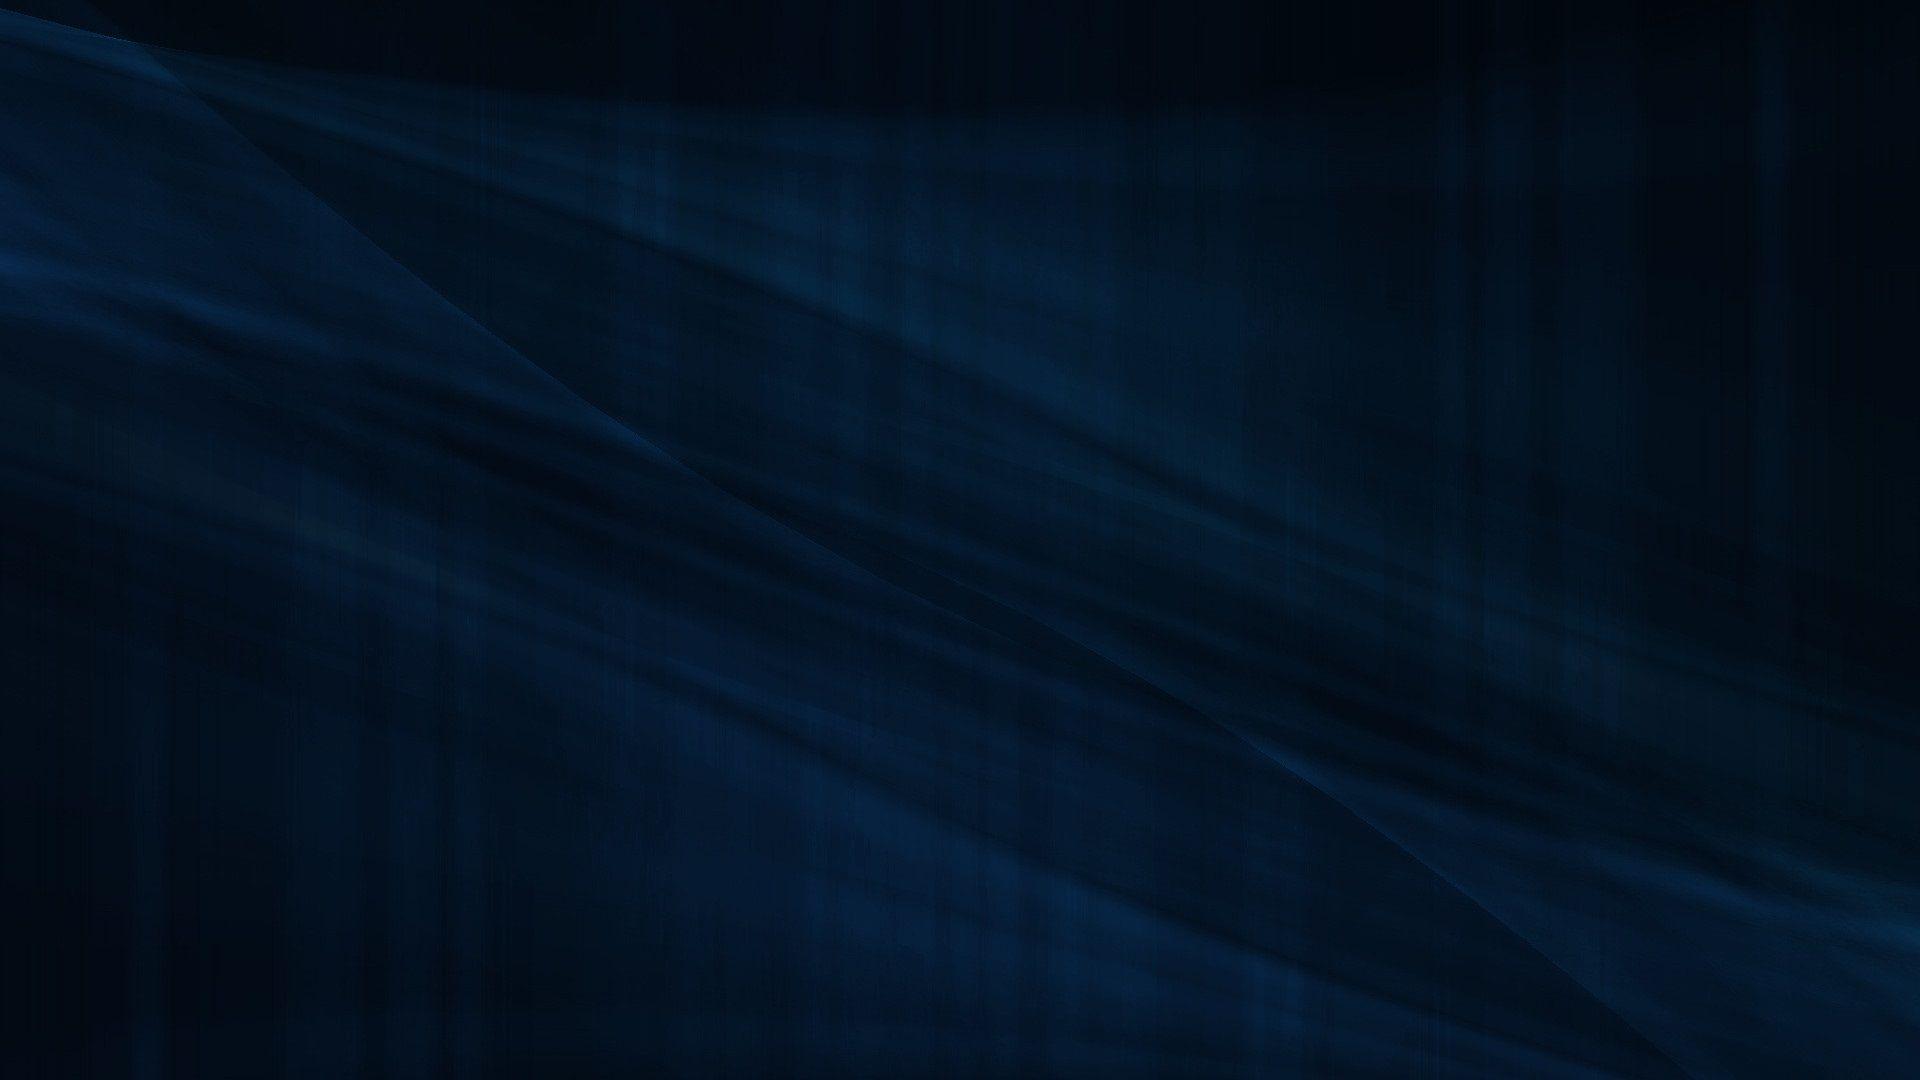 Abstract Blue Wallpaper Hd Dark Blue Wallpaper Blue Background Wallpapers Blue Wallpapers